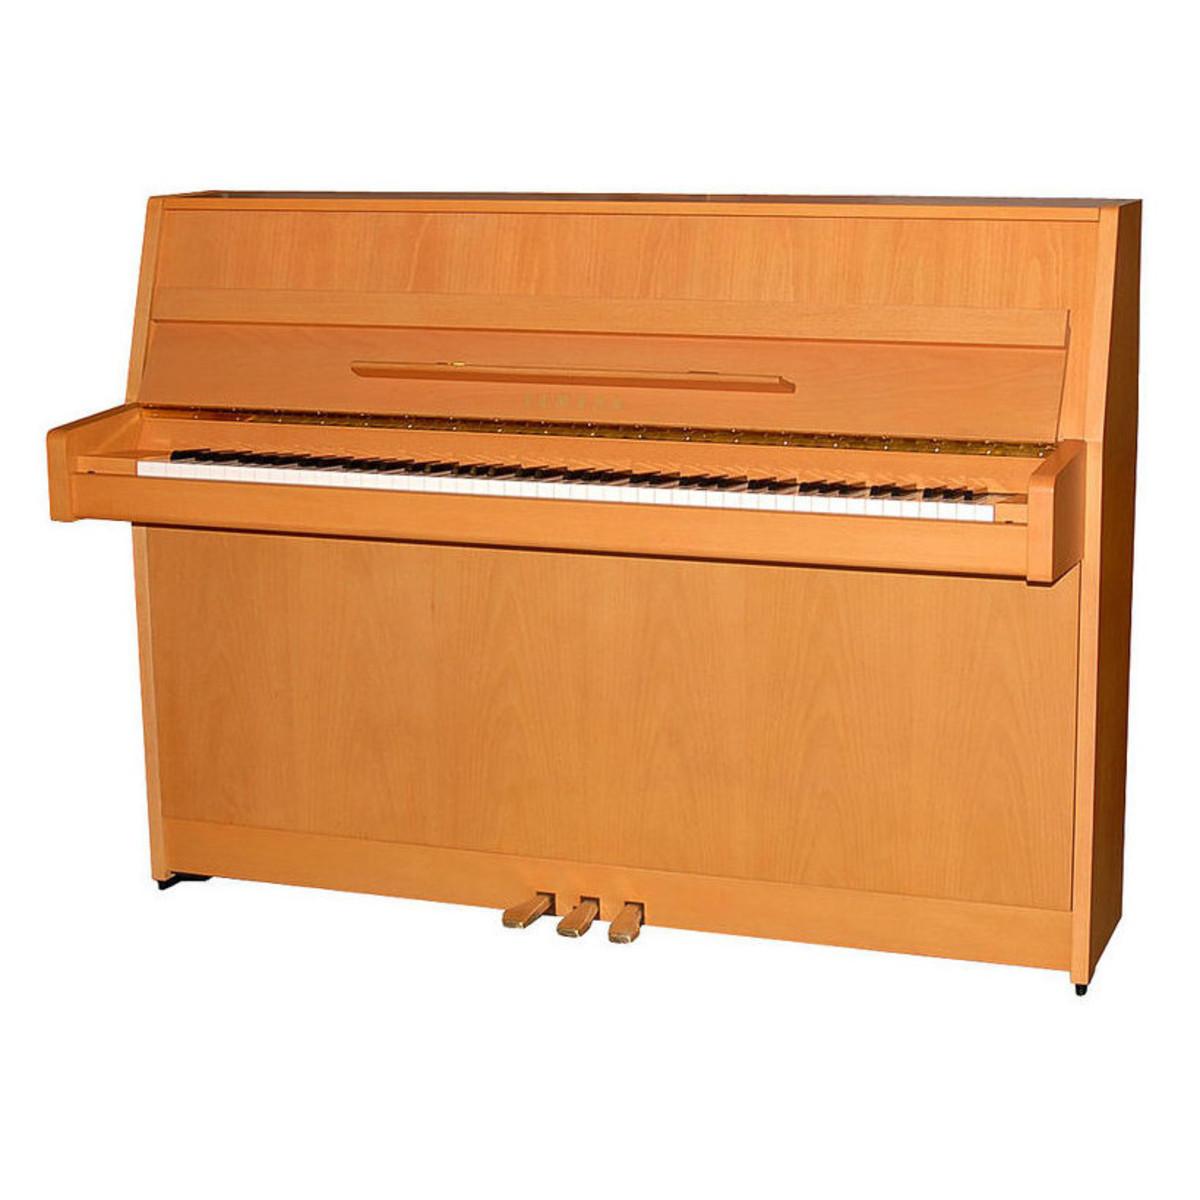 yamaha b1 upright acoustic piano natural beech satin at. Black Bedroom Furniture Sets. Home Design Ideas